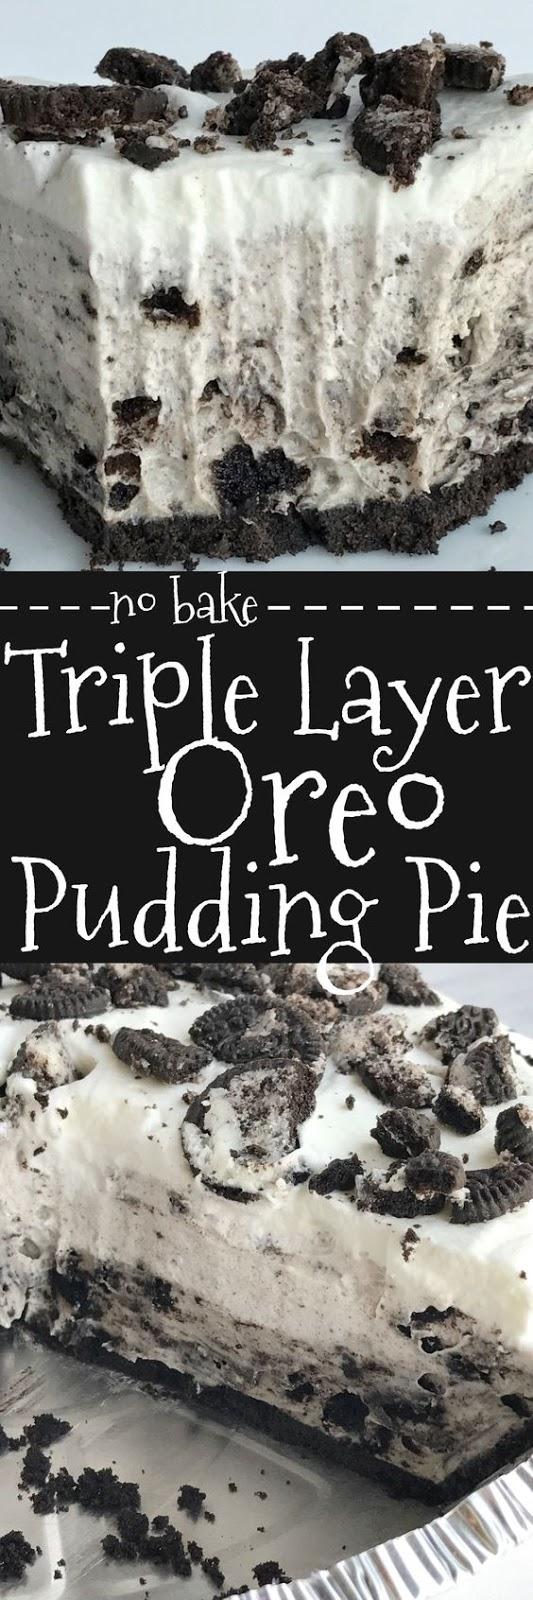 No Bake Triple Layer Oreo Pudding Pie